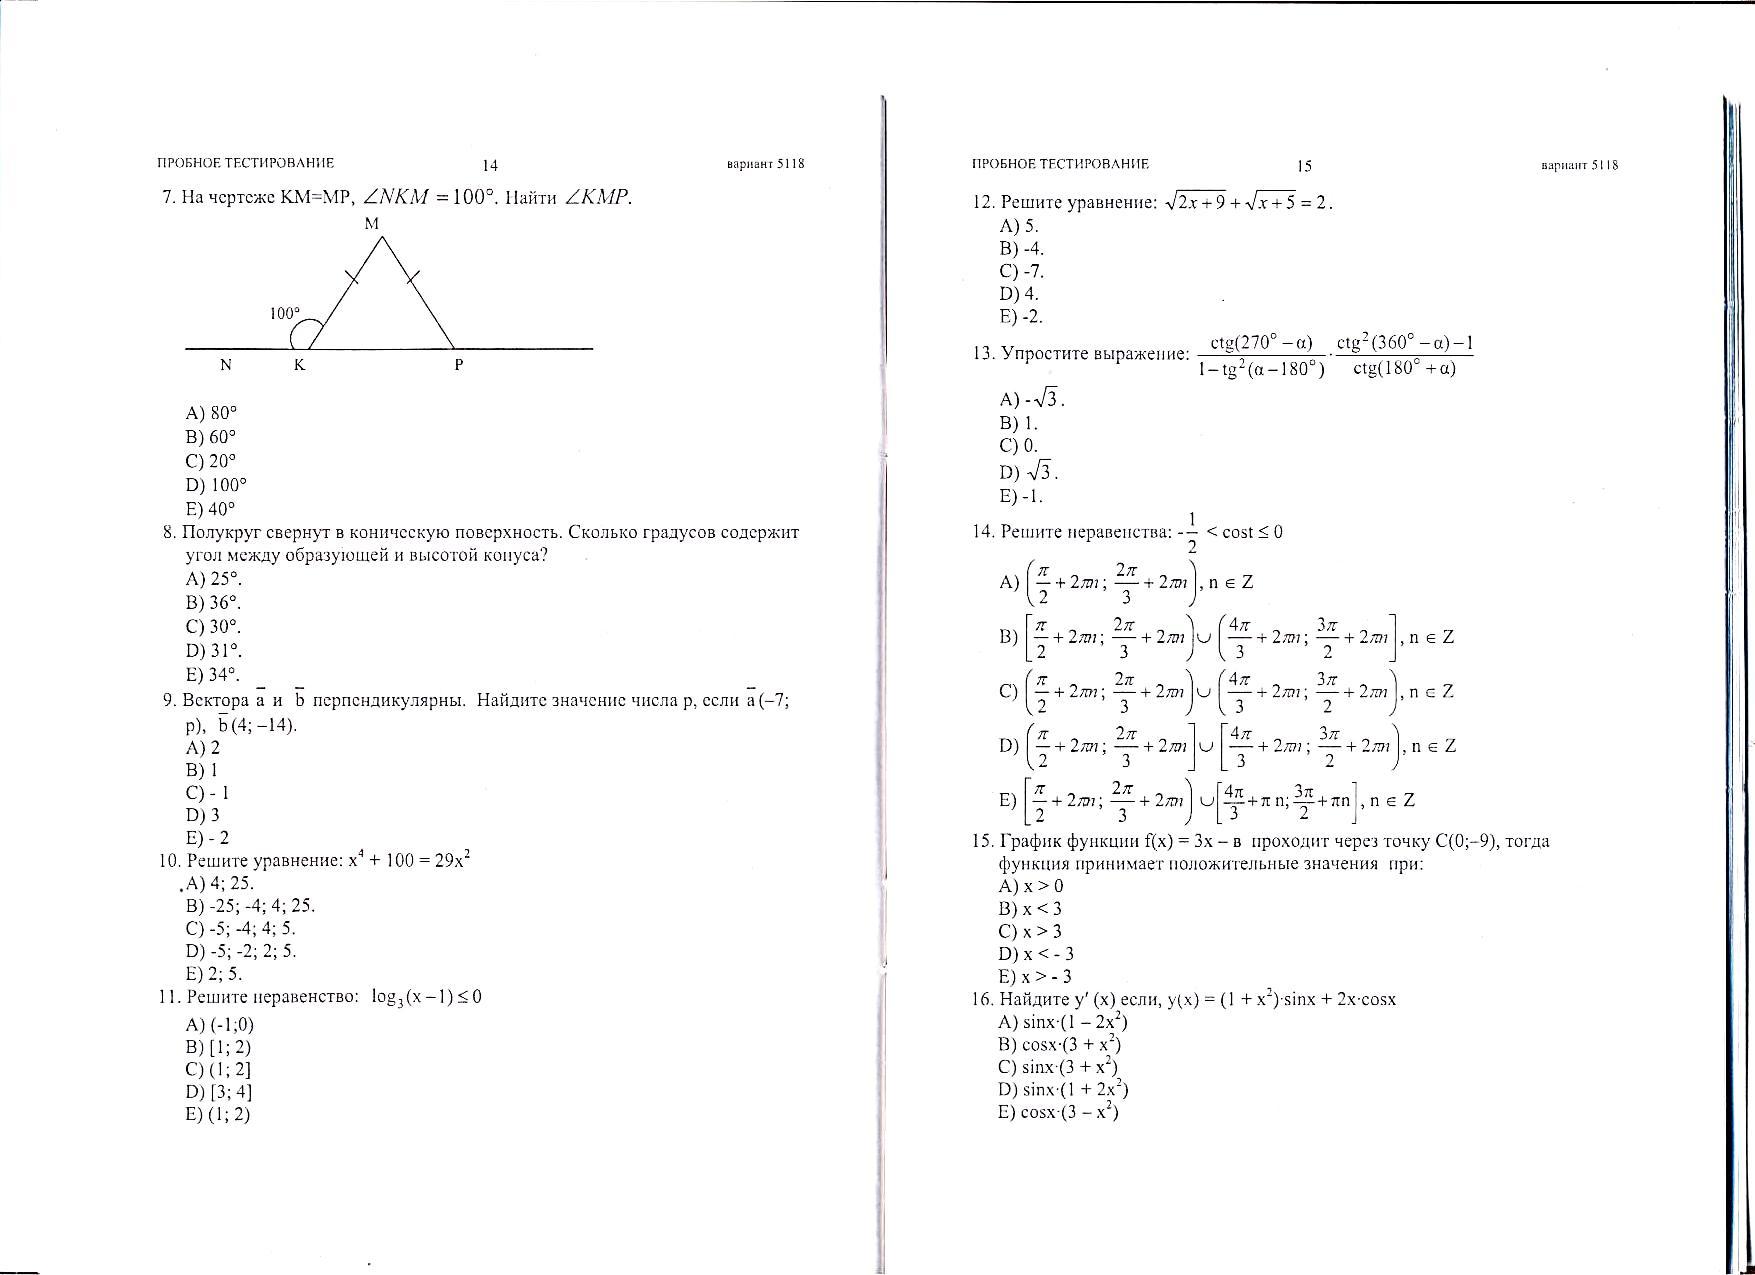 D:\Dokuments\Школа\Тесты ЕНТ\2011 год тесты\5100-5160\5118 (2).jpg